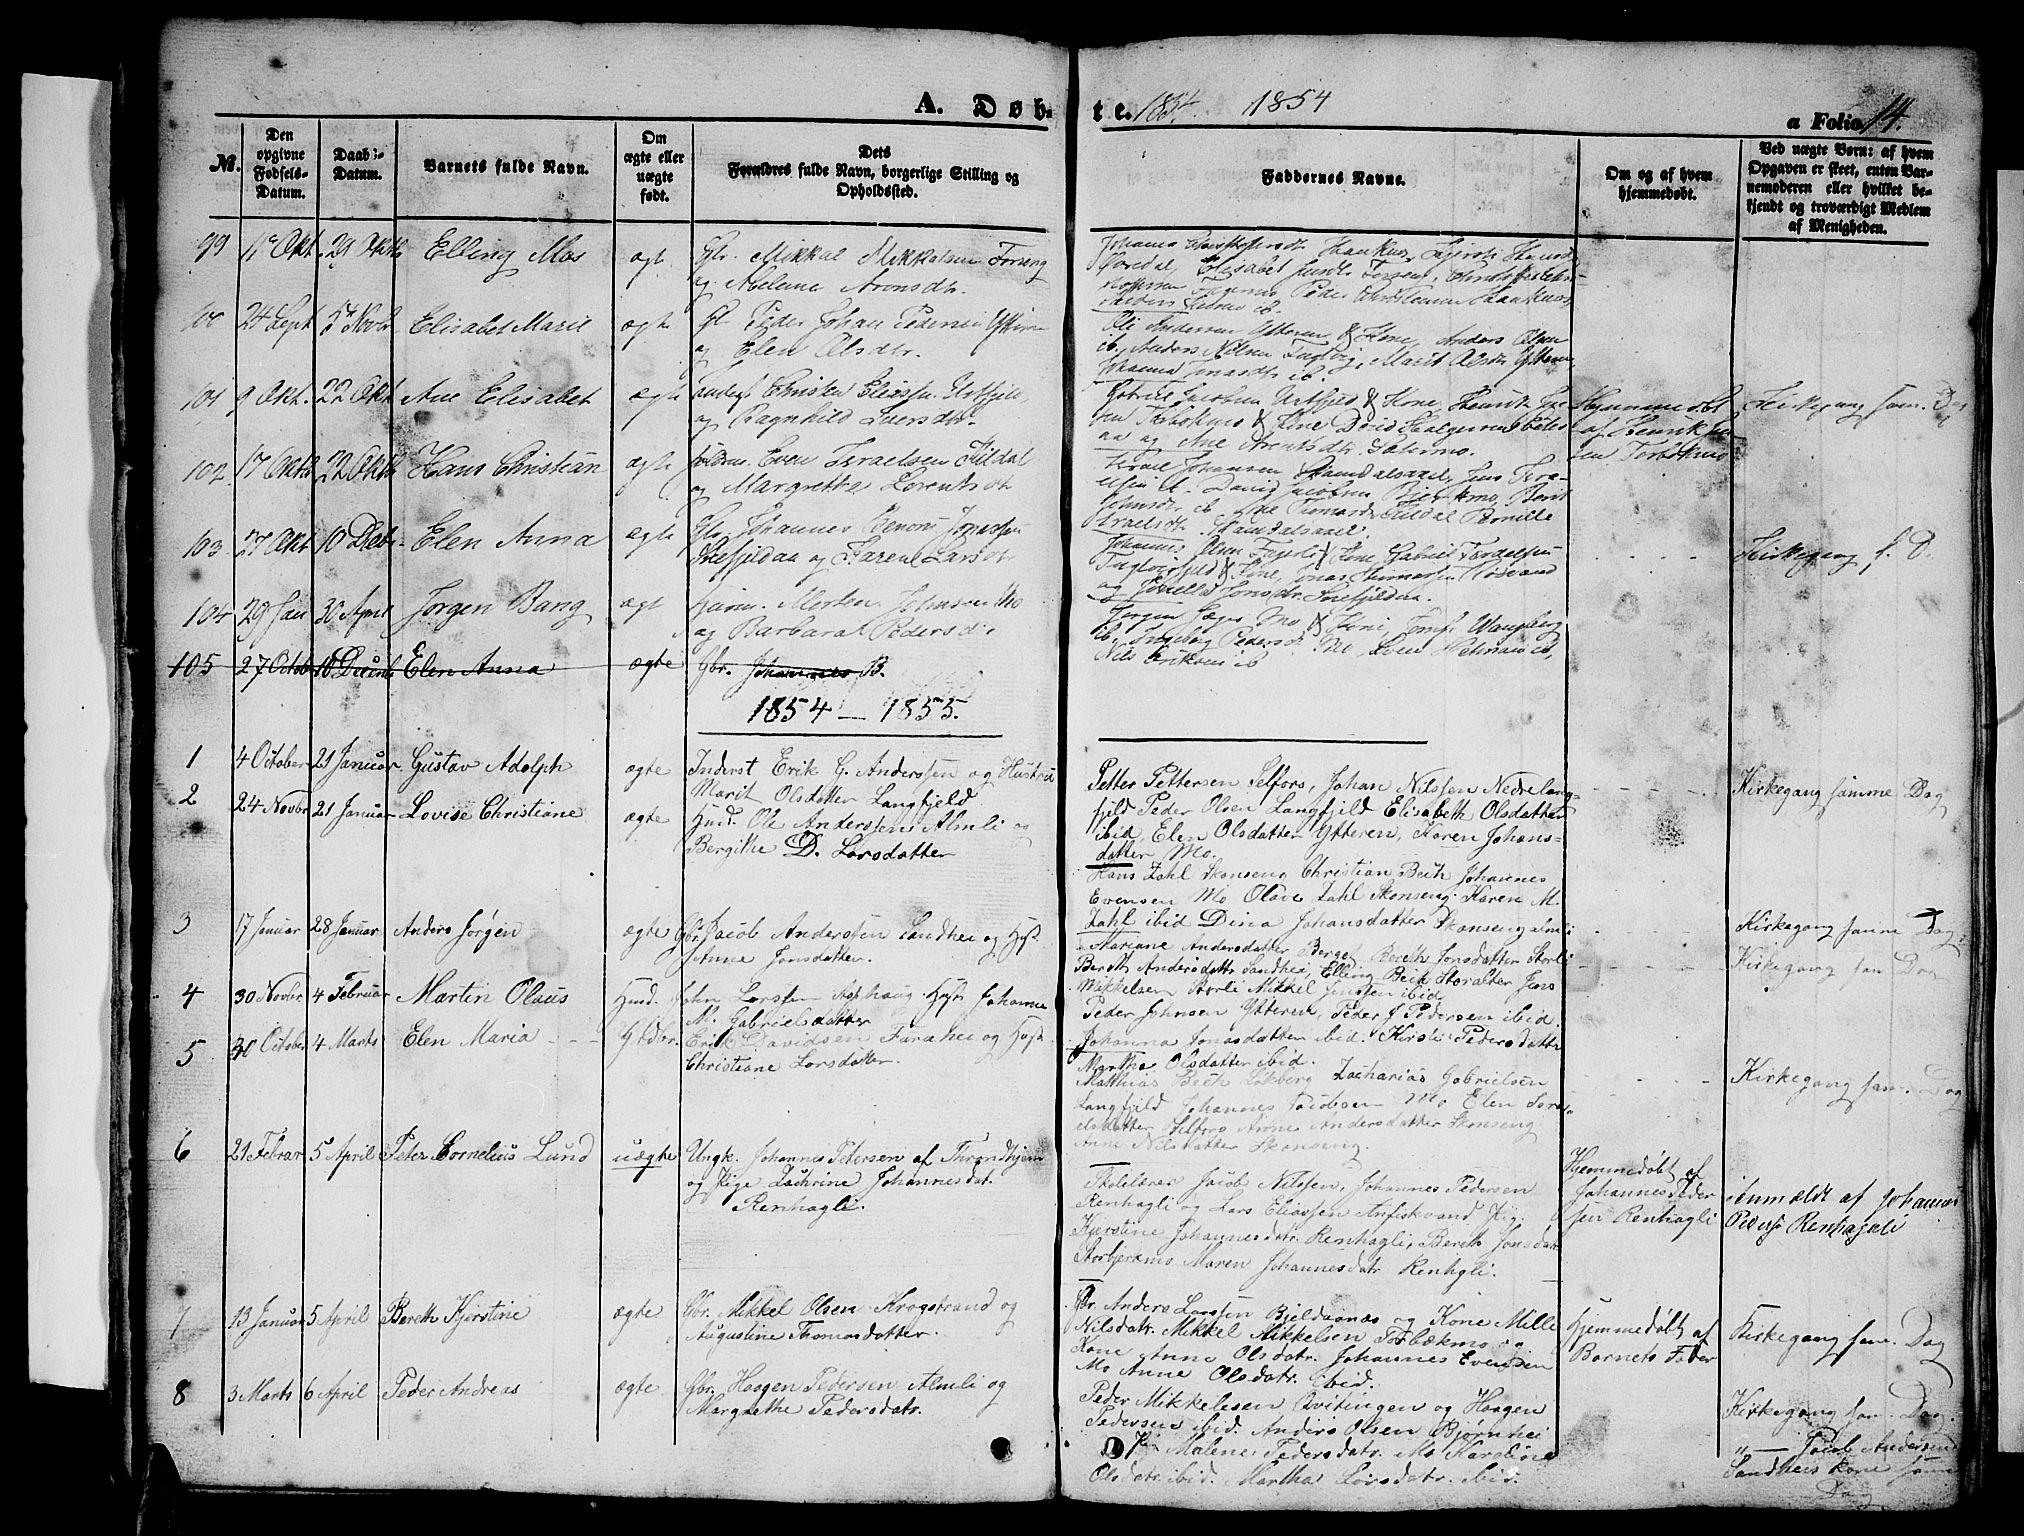 SAT, Ministerialprotokoller, klokkerbøker og fødselsregistre - Nordland, 827/L0414: Klokkerbok nr. 827C03, 1853-1865, s. 14